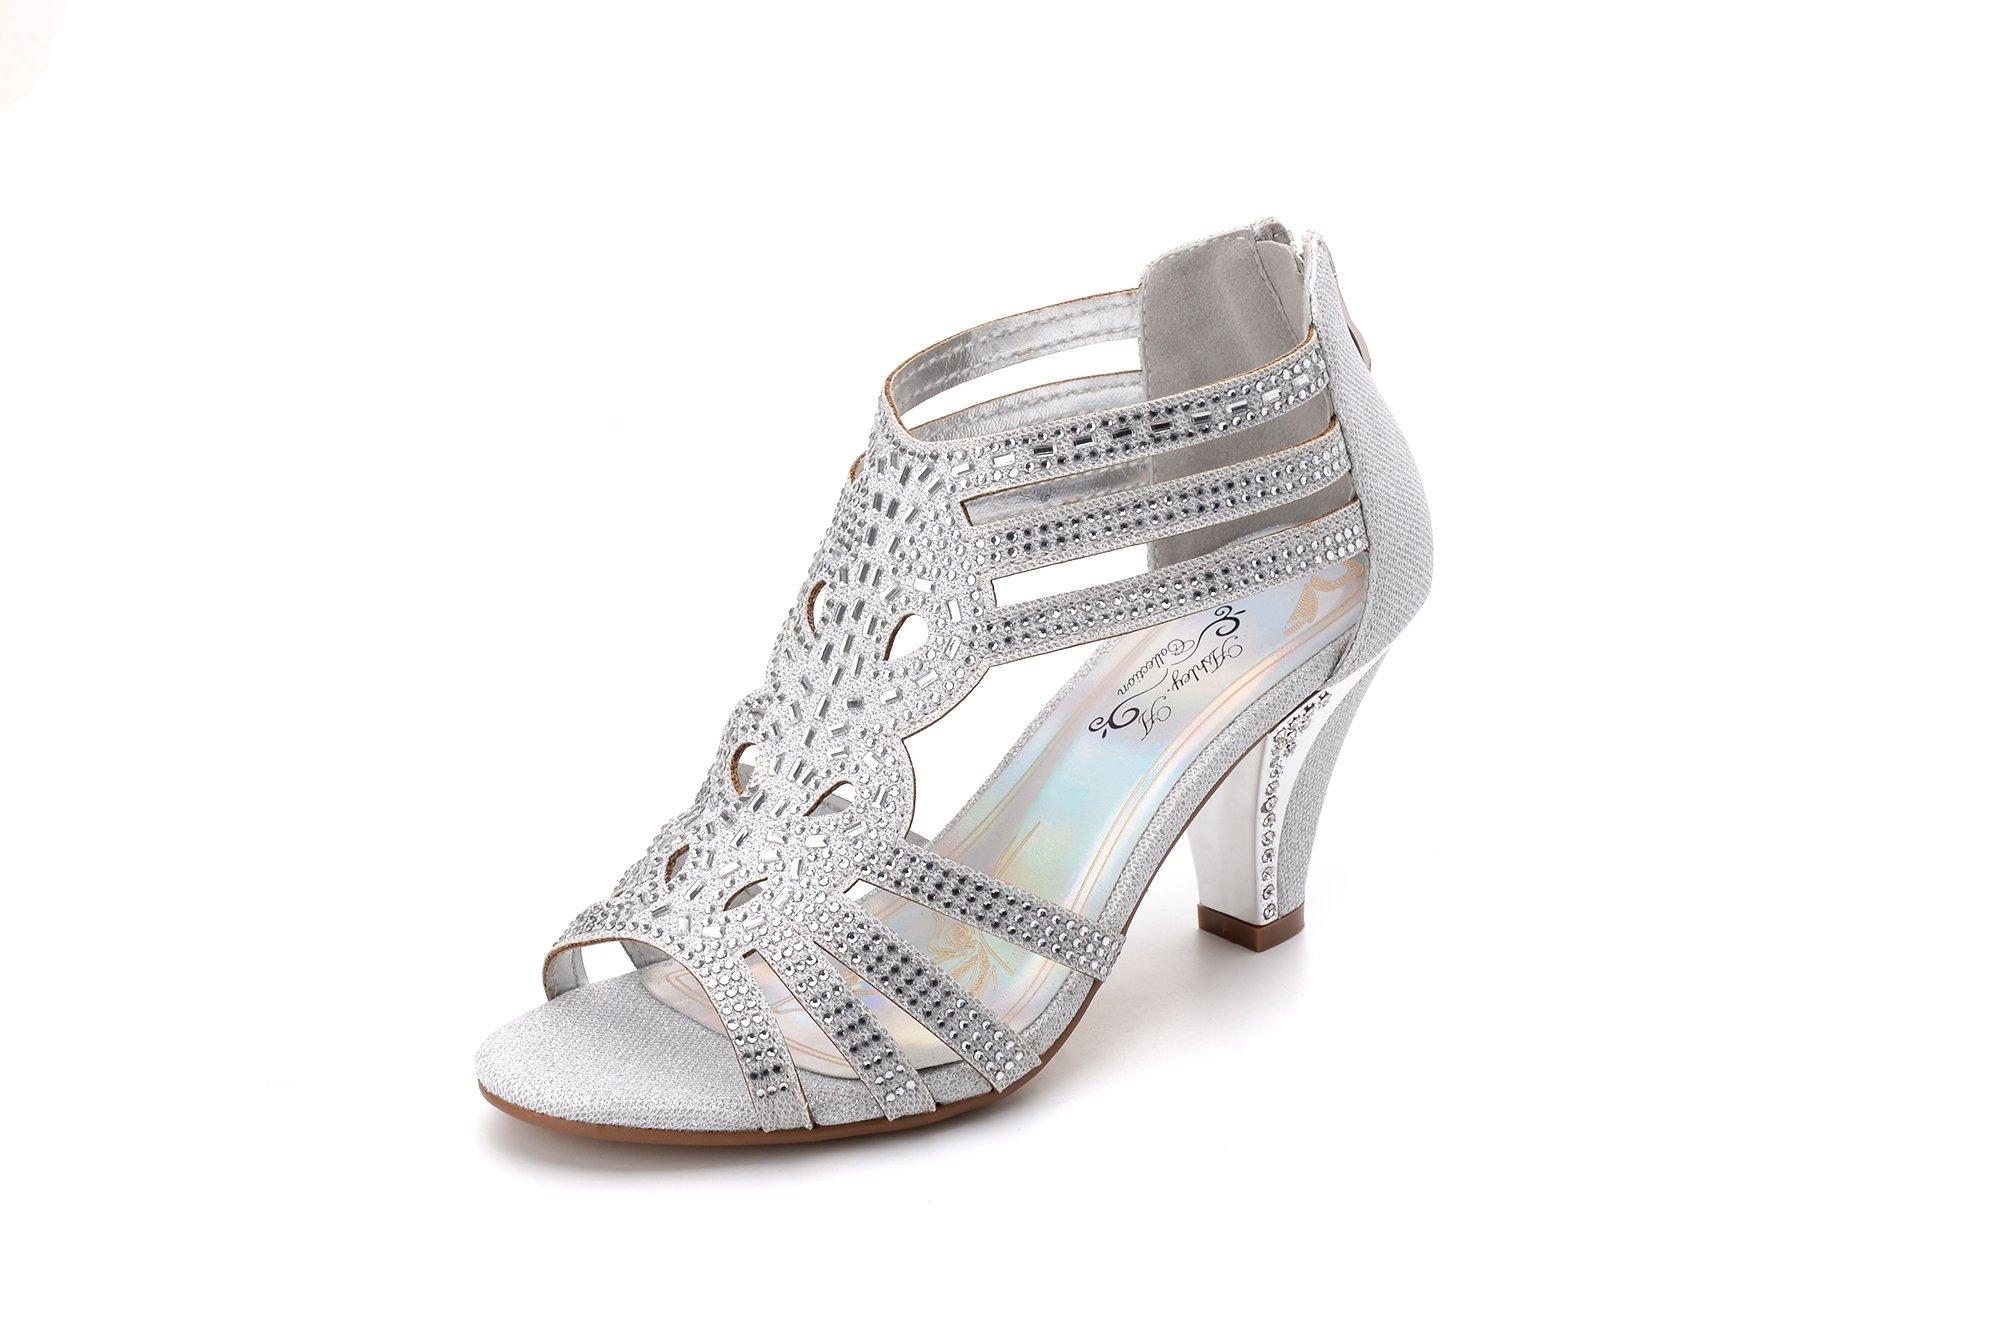 Ashley A Women's Lexie Crystal Dress Heels Low Heels Wedding Shoes KINI25 Silver 7